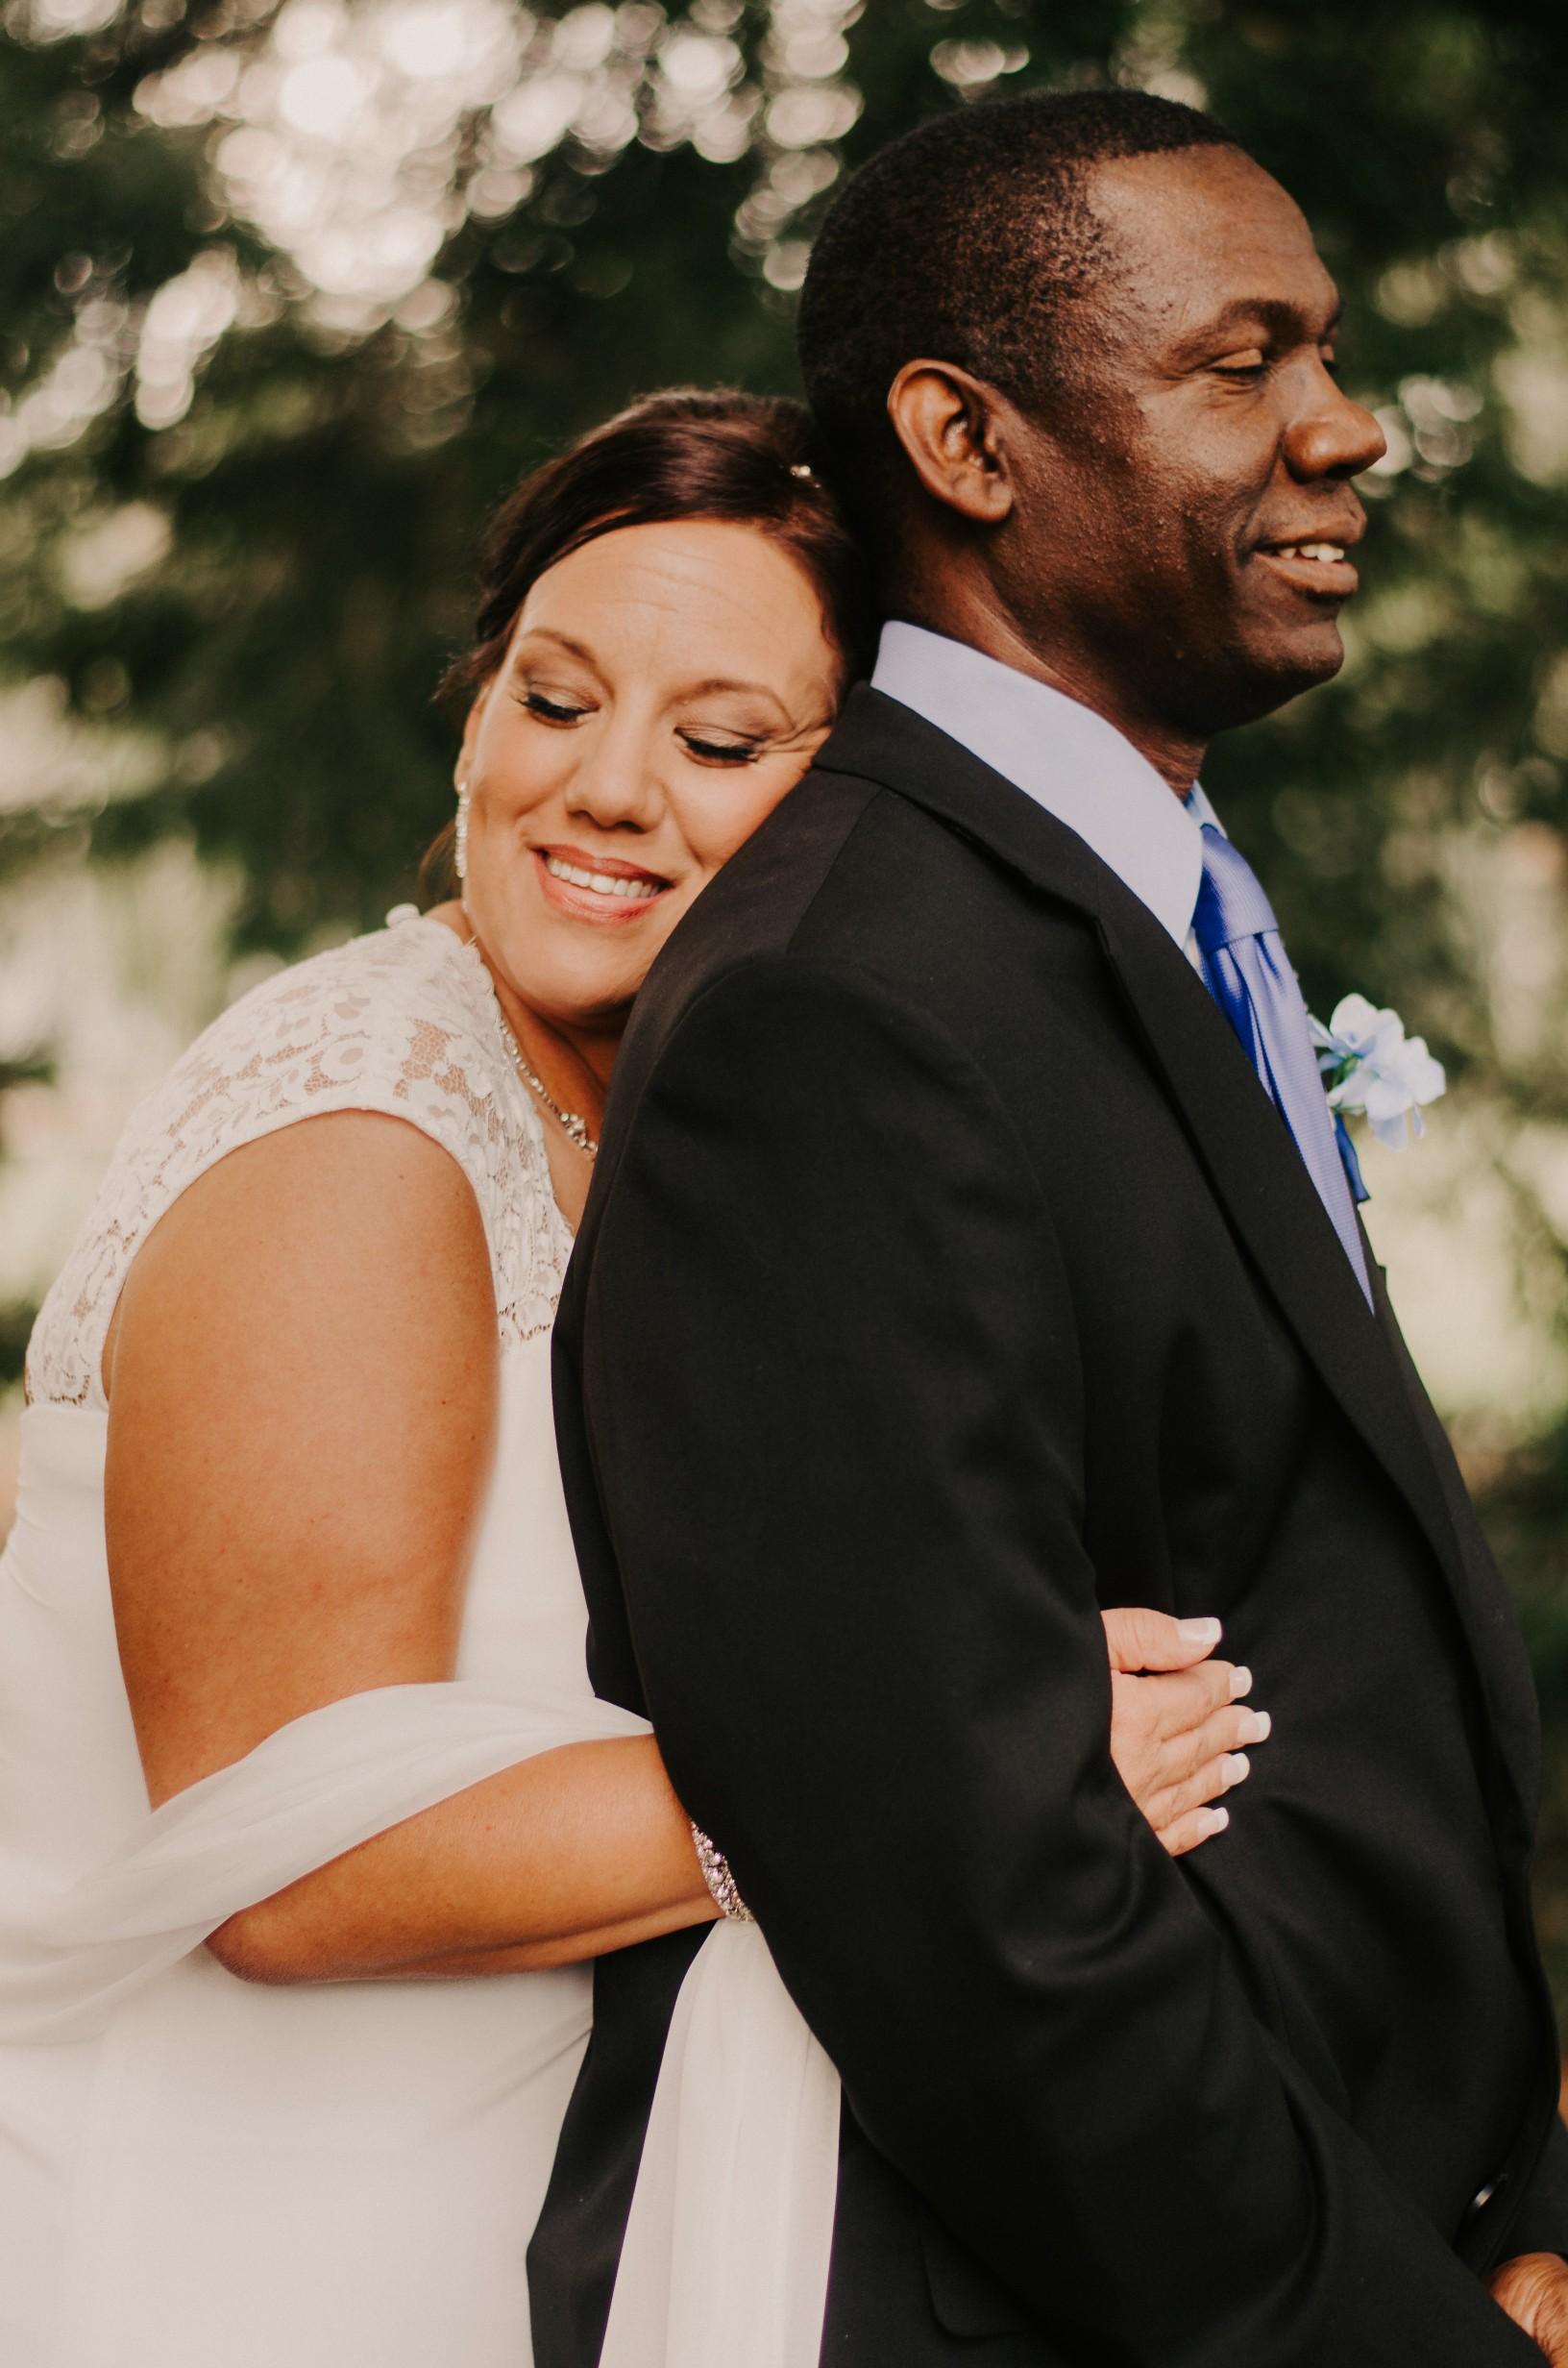 bride-groom-wedding-photography.jpg.